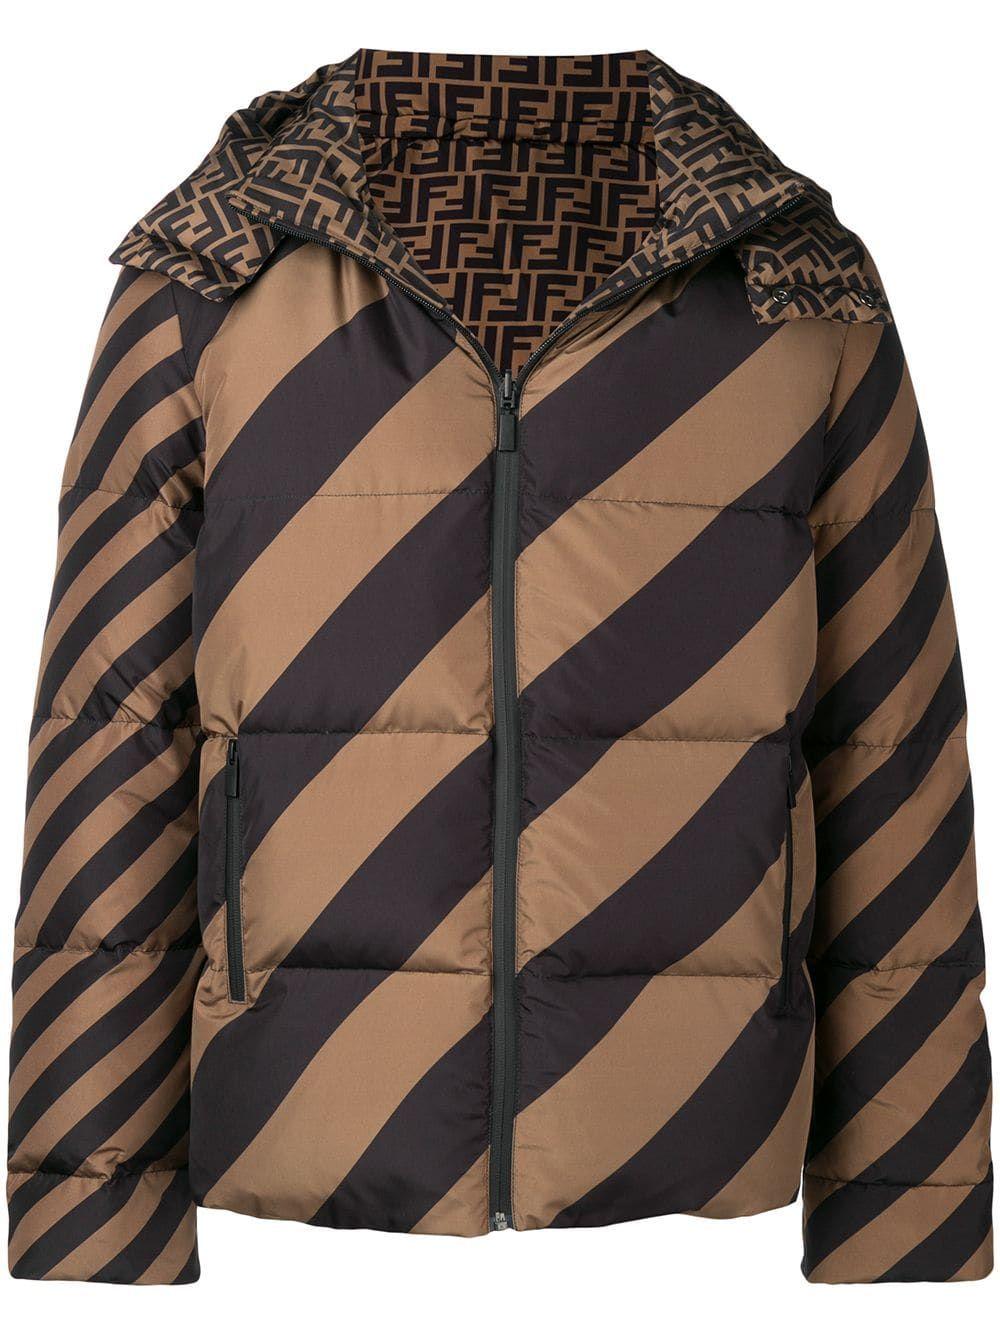 Fendi Logo Puffer Jacket Farfetch Fashion Jackets Clothes [ 1334 x 1000 Pixel ]